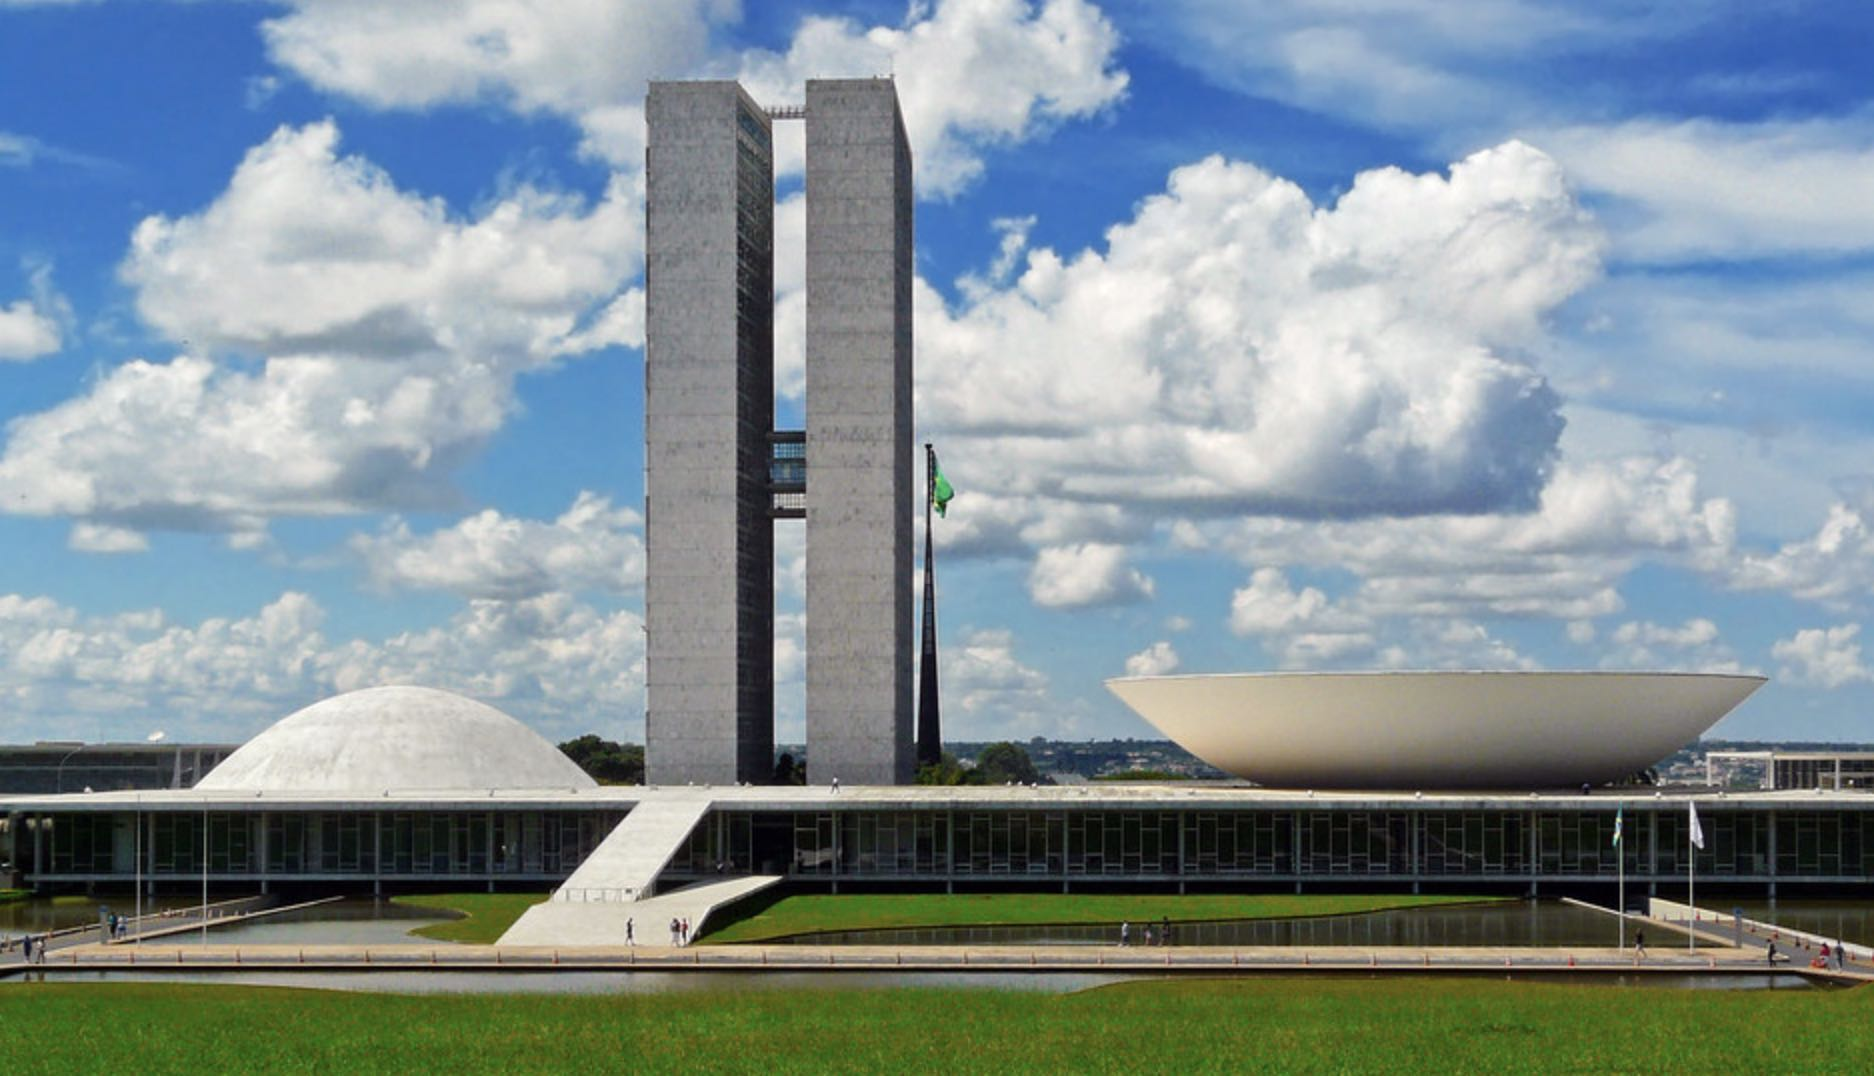 Brasilia, Recuperación económica, Planalto, Jair Bolsonaro